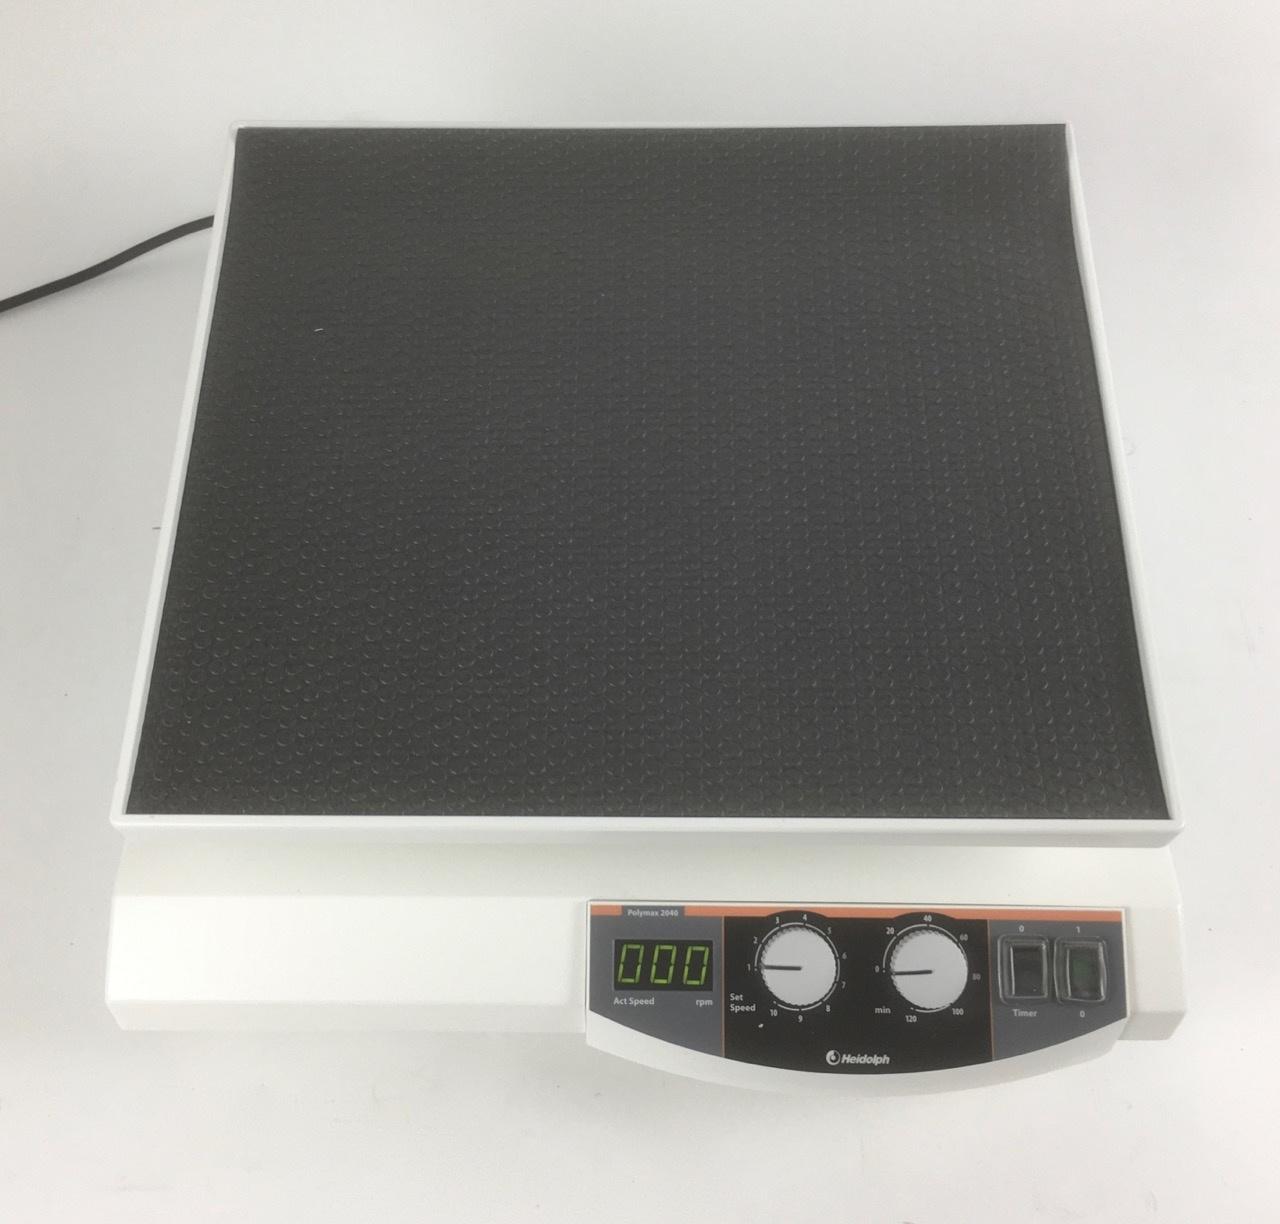 Heidolph Heidolph Polymax 2040 (10° Neigungswinkel) Plattformschüttler